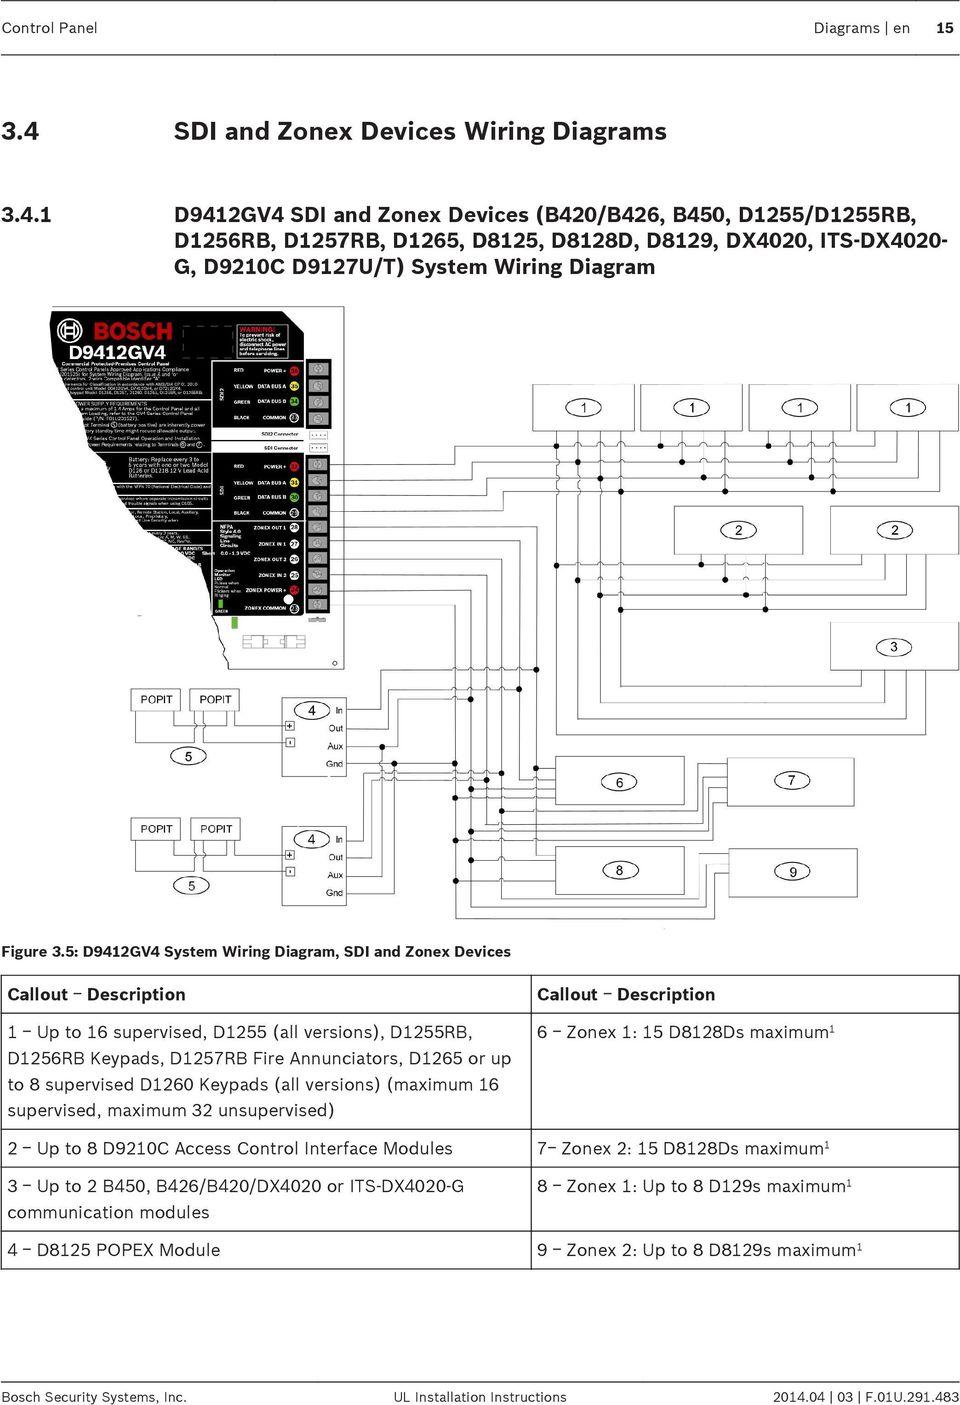 medium resolution of 1 d9412gv4 sdi and zonex devices b420 b426 b450 d1255 d1255rb 16 16 en diagrams control